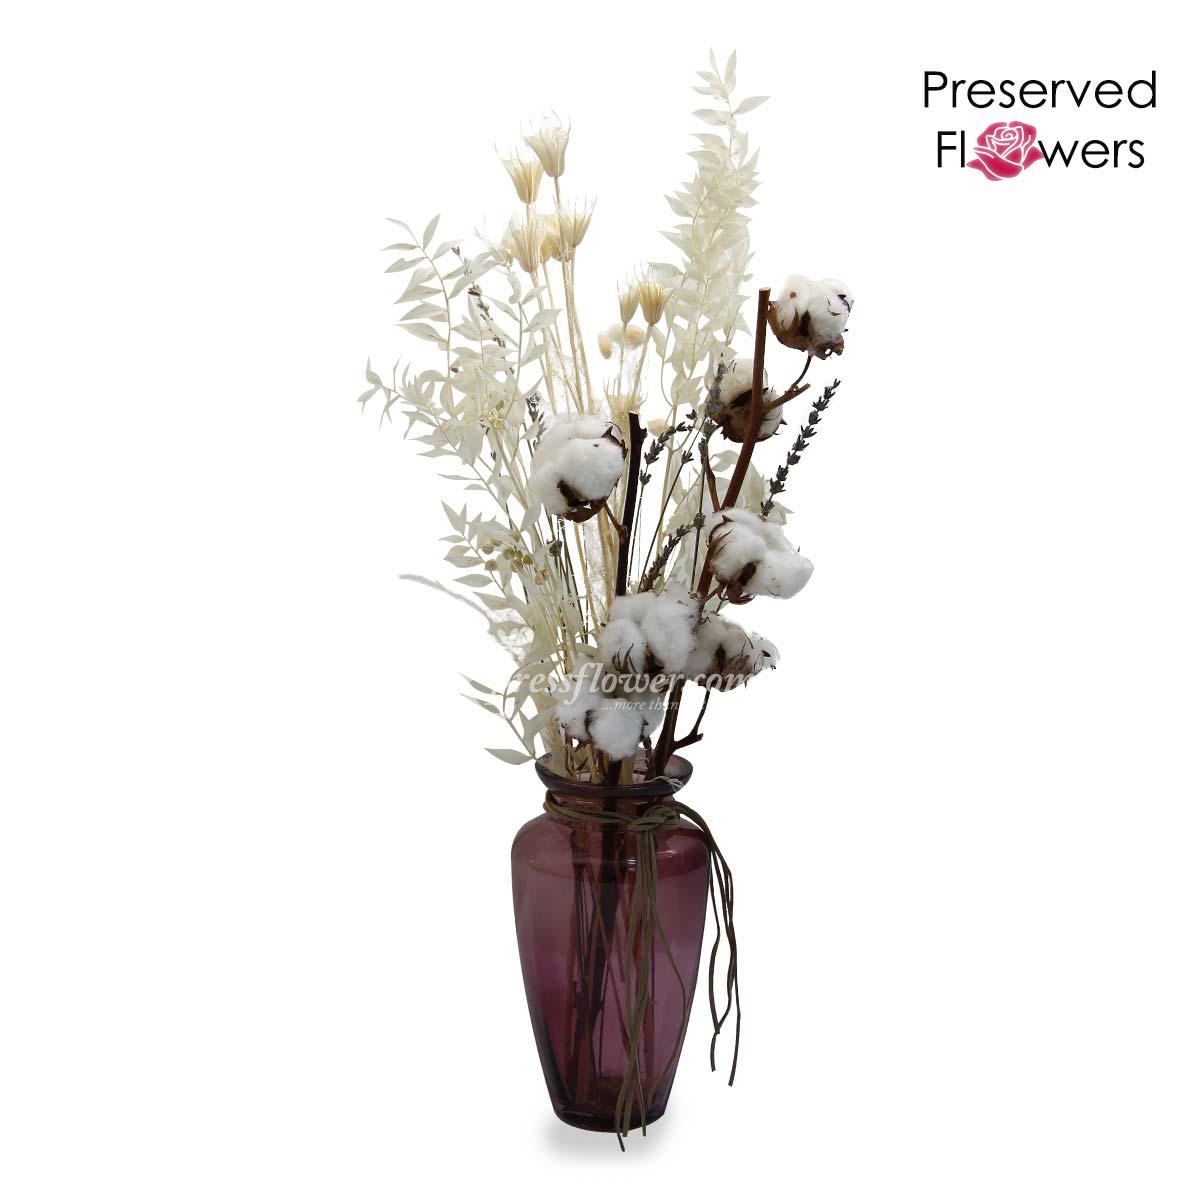 PR2109_Perfectly Splendid (Dried Flowers)_B